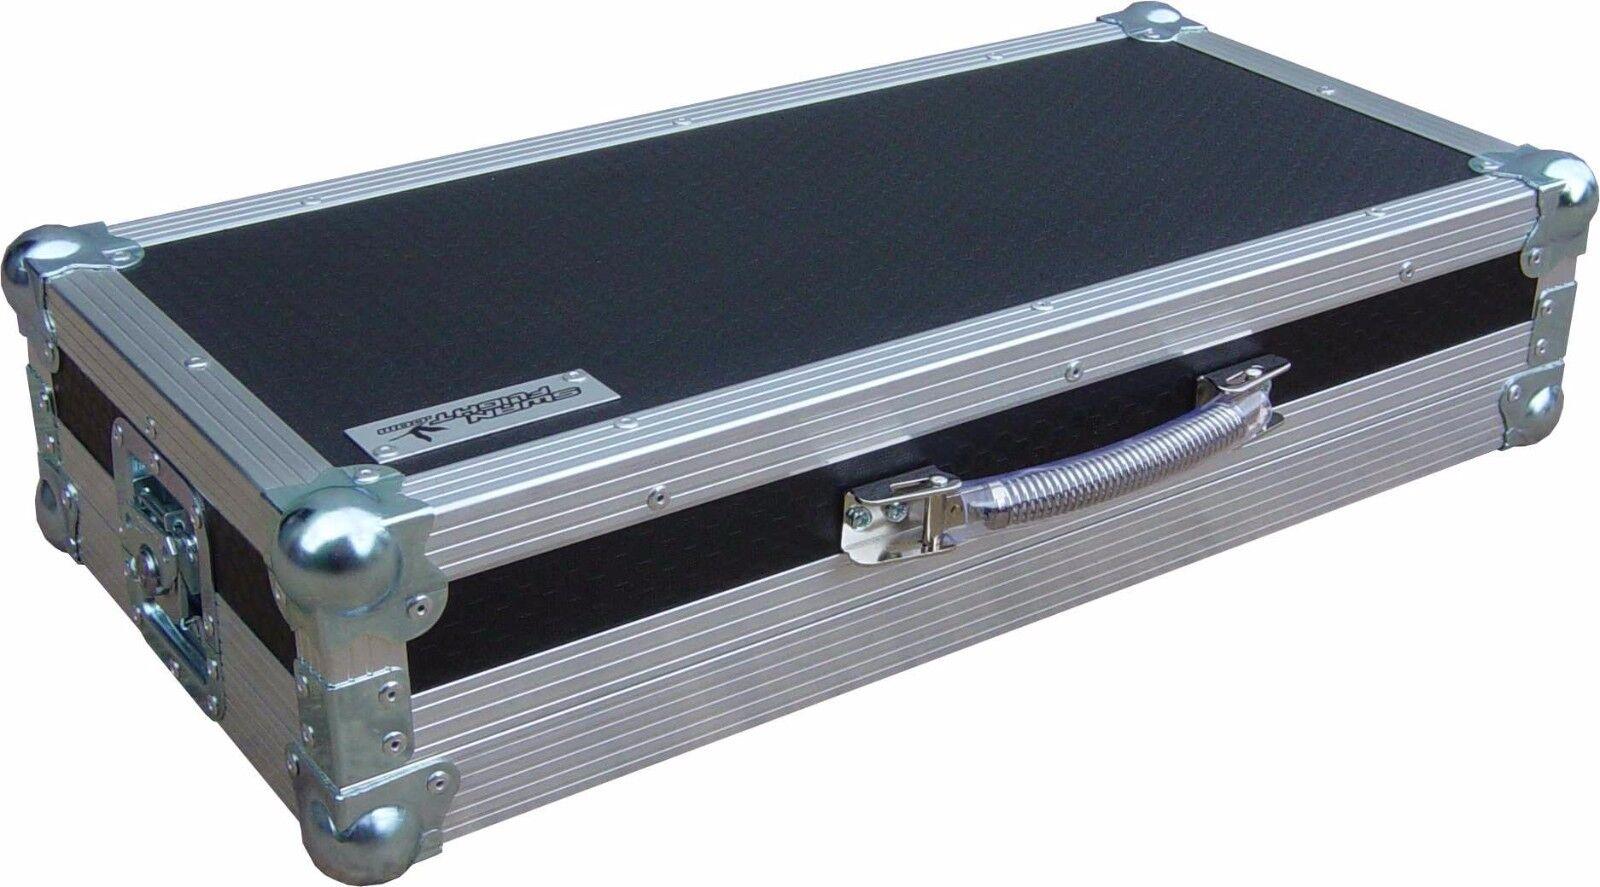 Line 6 Helix LT Guitar Pedal Swan Flight Case (Hex)